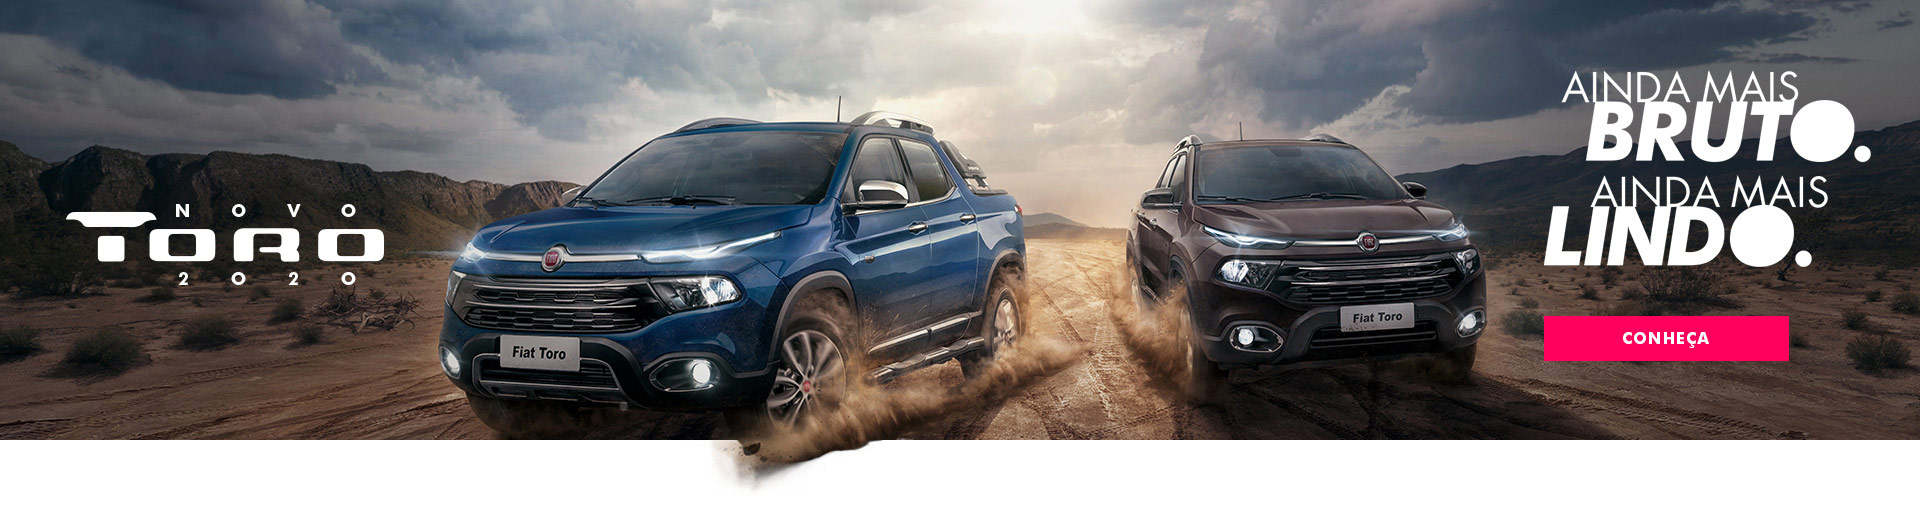 FIAT: Carros 0km, Sedan, Hatch, Minivan e SUVs